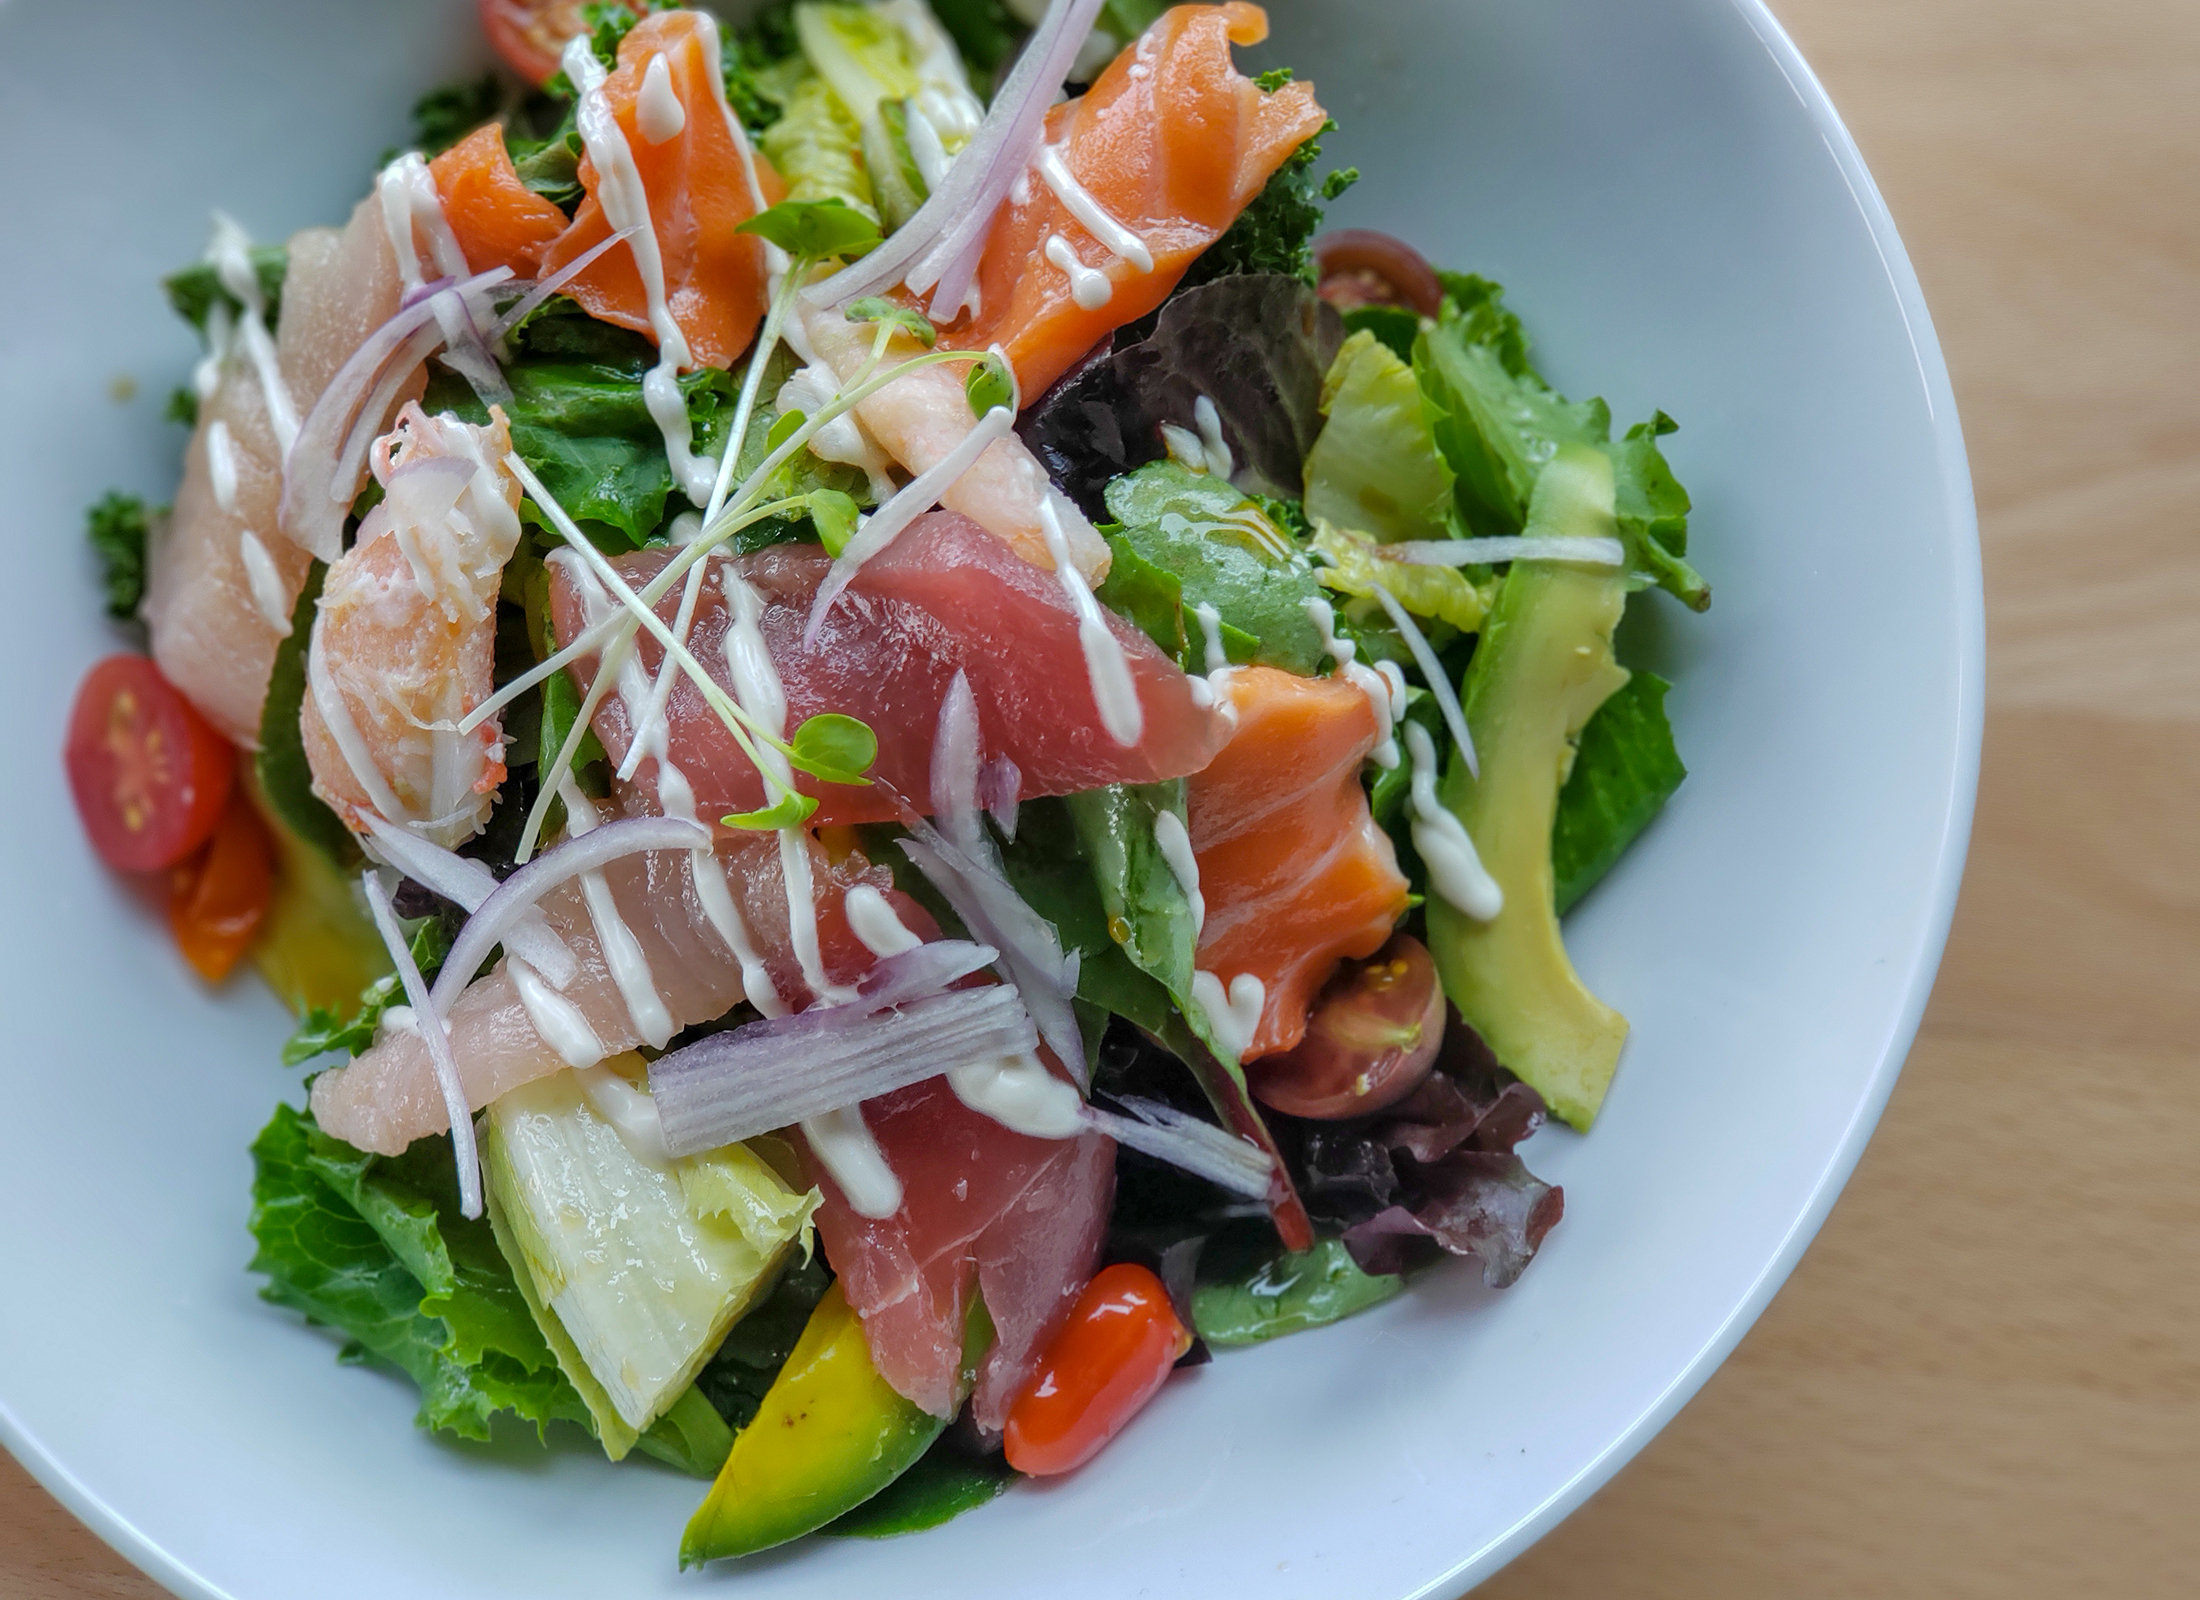 Sashimi salad with tuna, salmon, crab at Raku Ramen and Rolls in Santa Rosa. Heather Irwin/PD